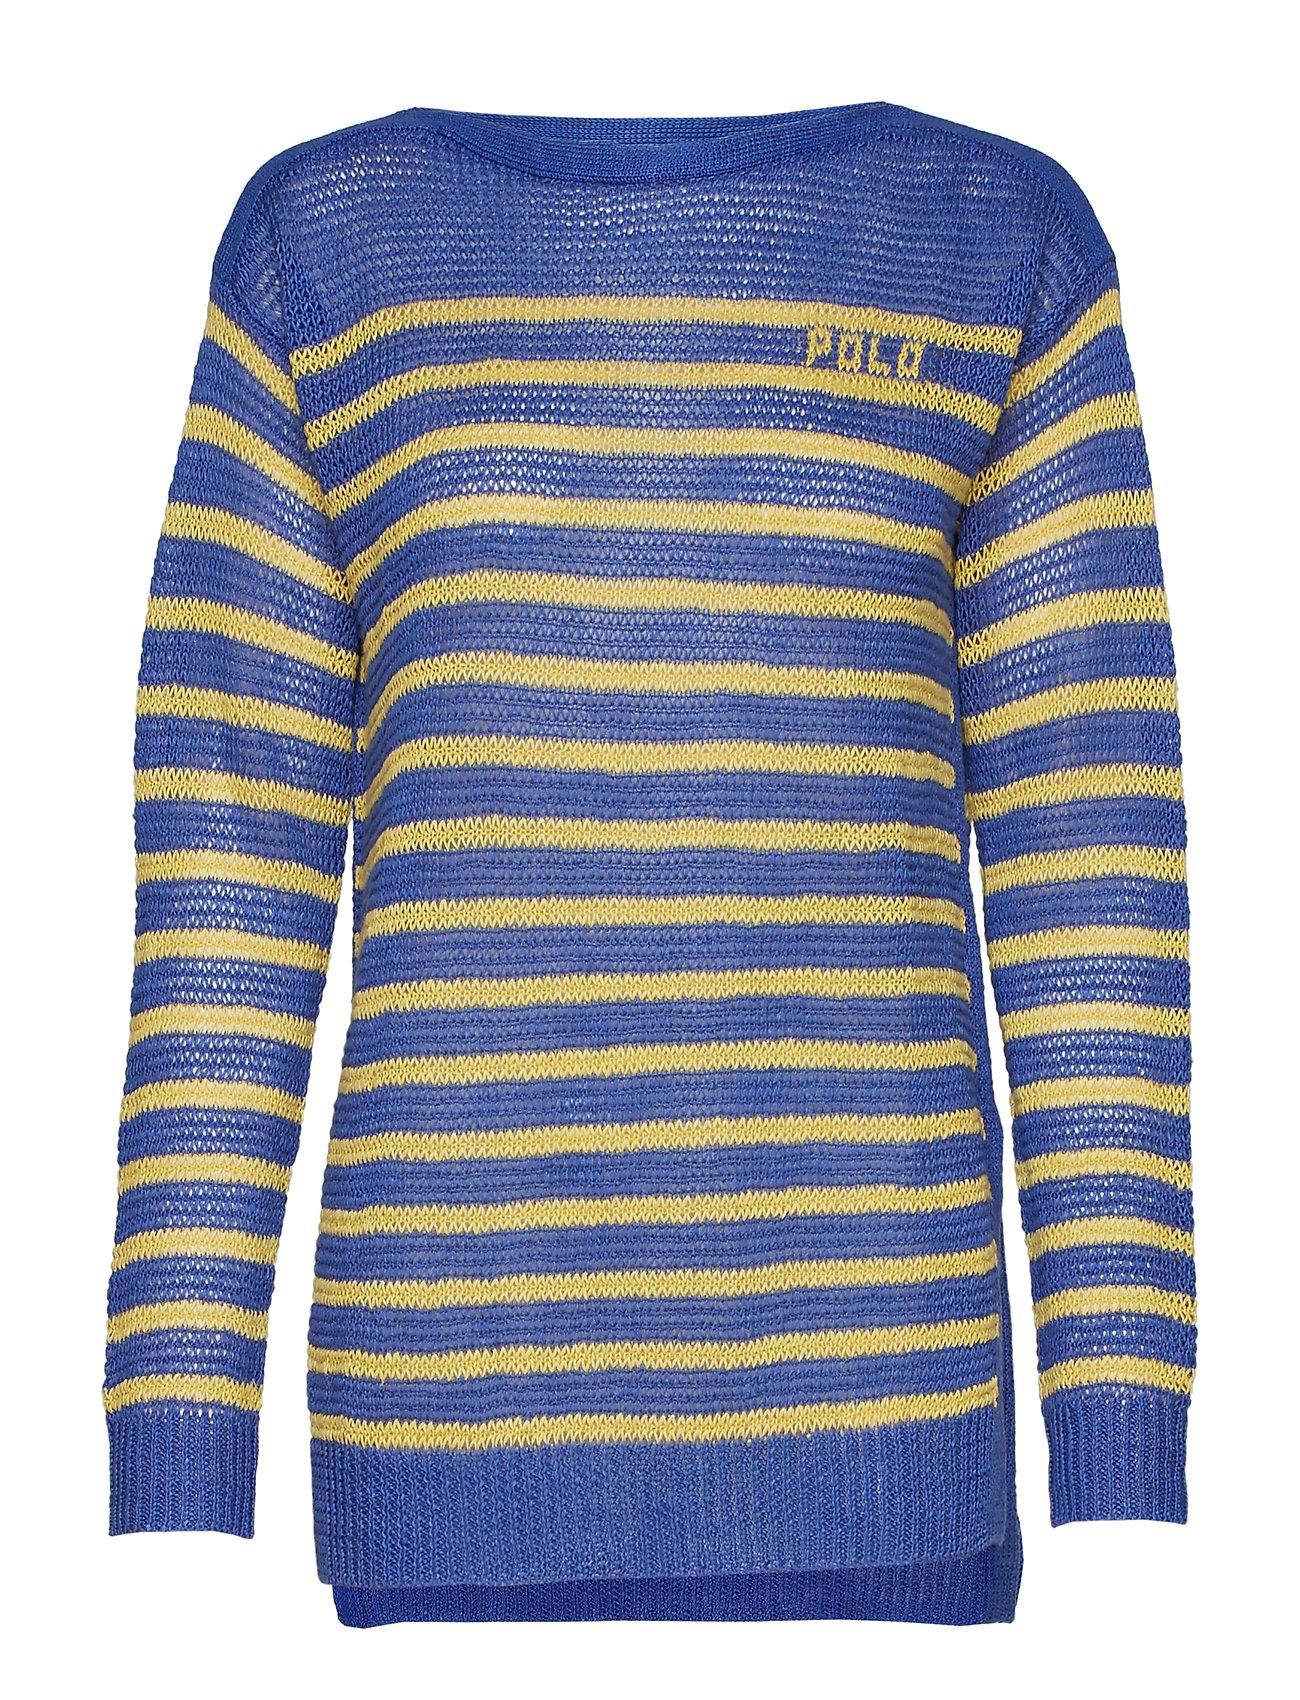 Polo Striped Lauren Sweatermaidstone suRalph Blue Linen WEBoeQrdCx